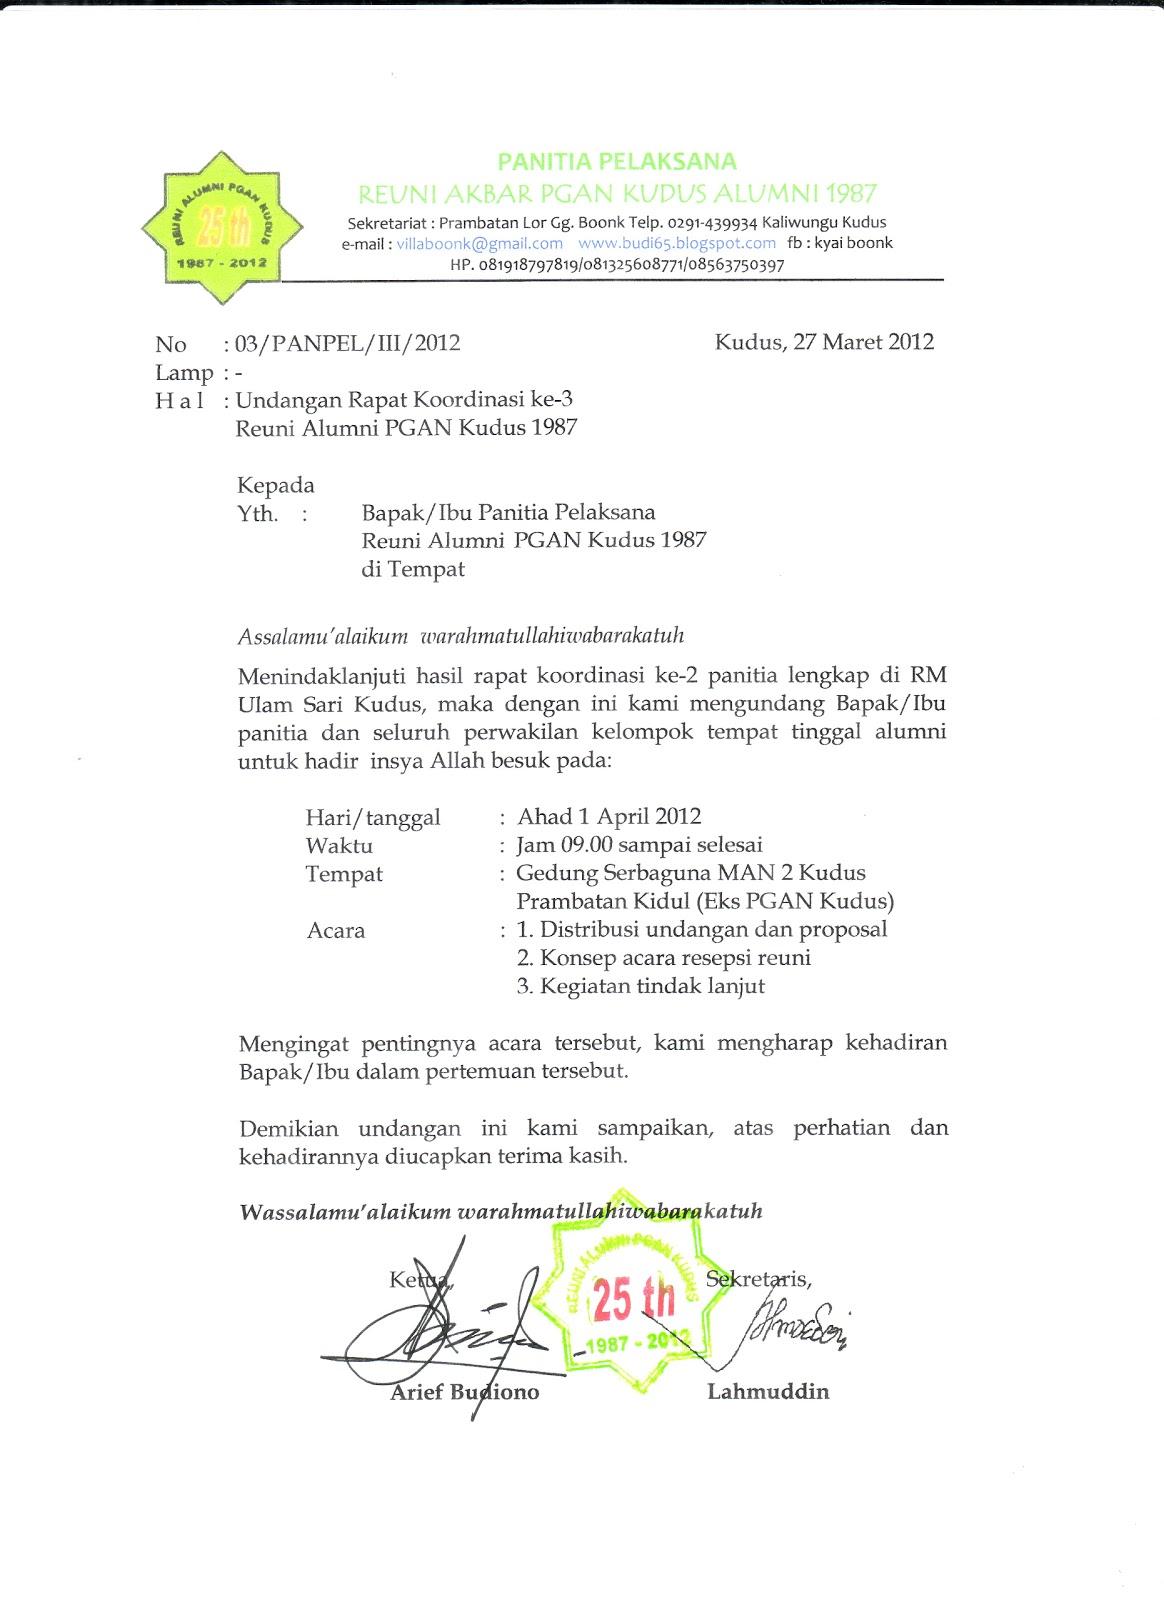 Contoh Surat Undangan Rapat Reuni Suratmenyurat Net